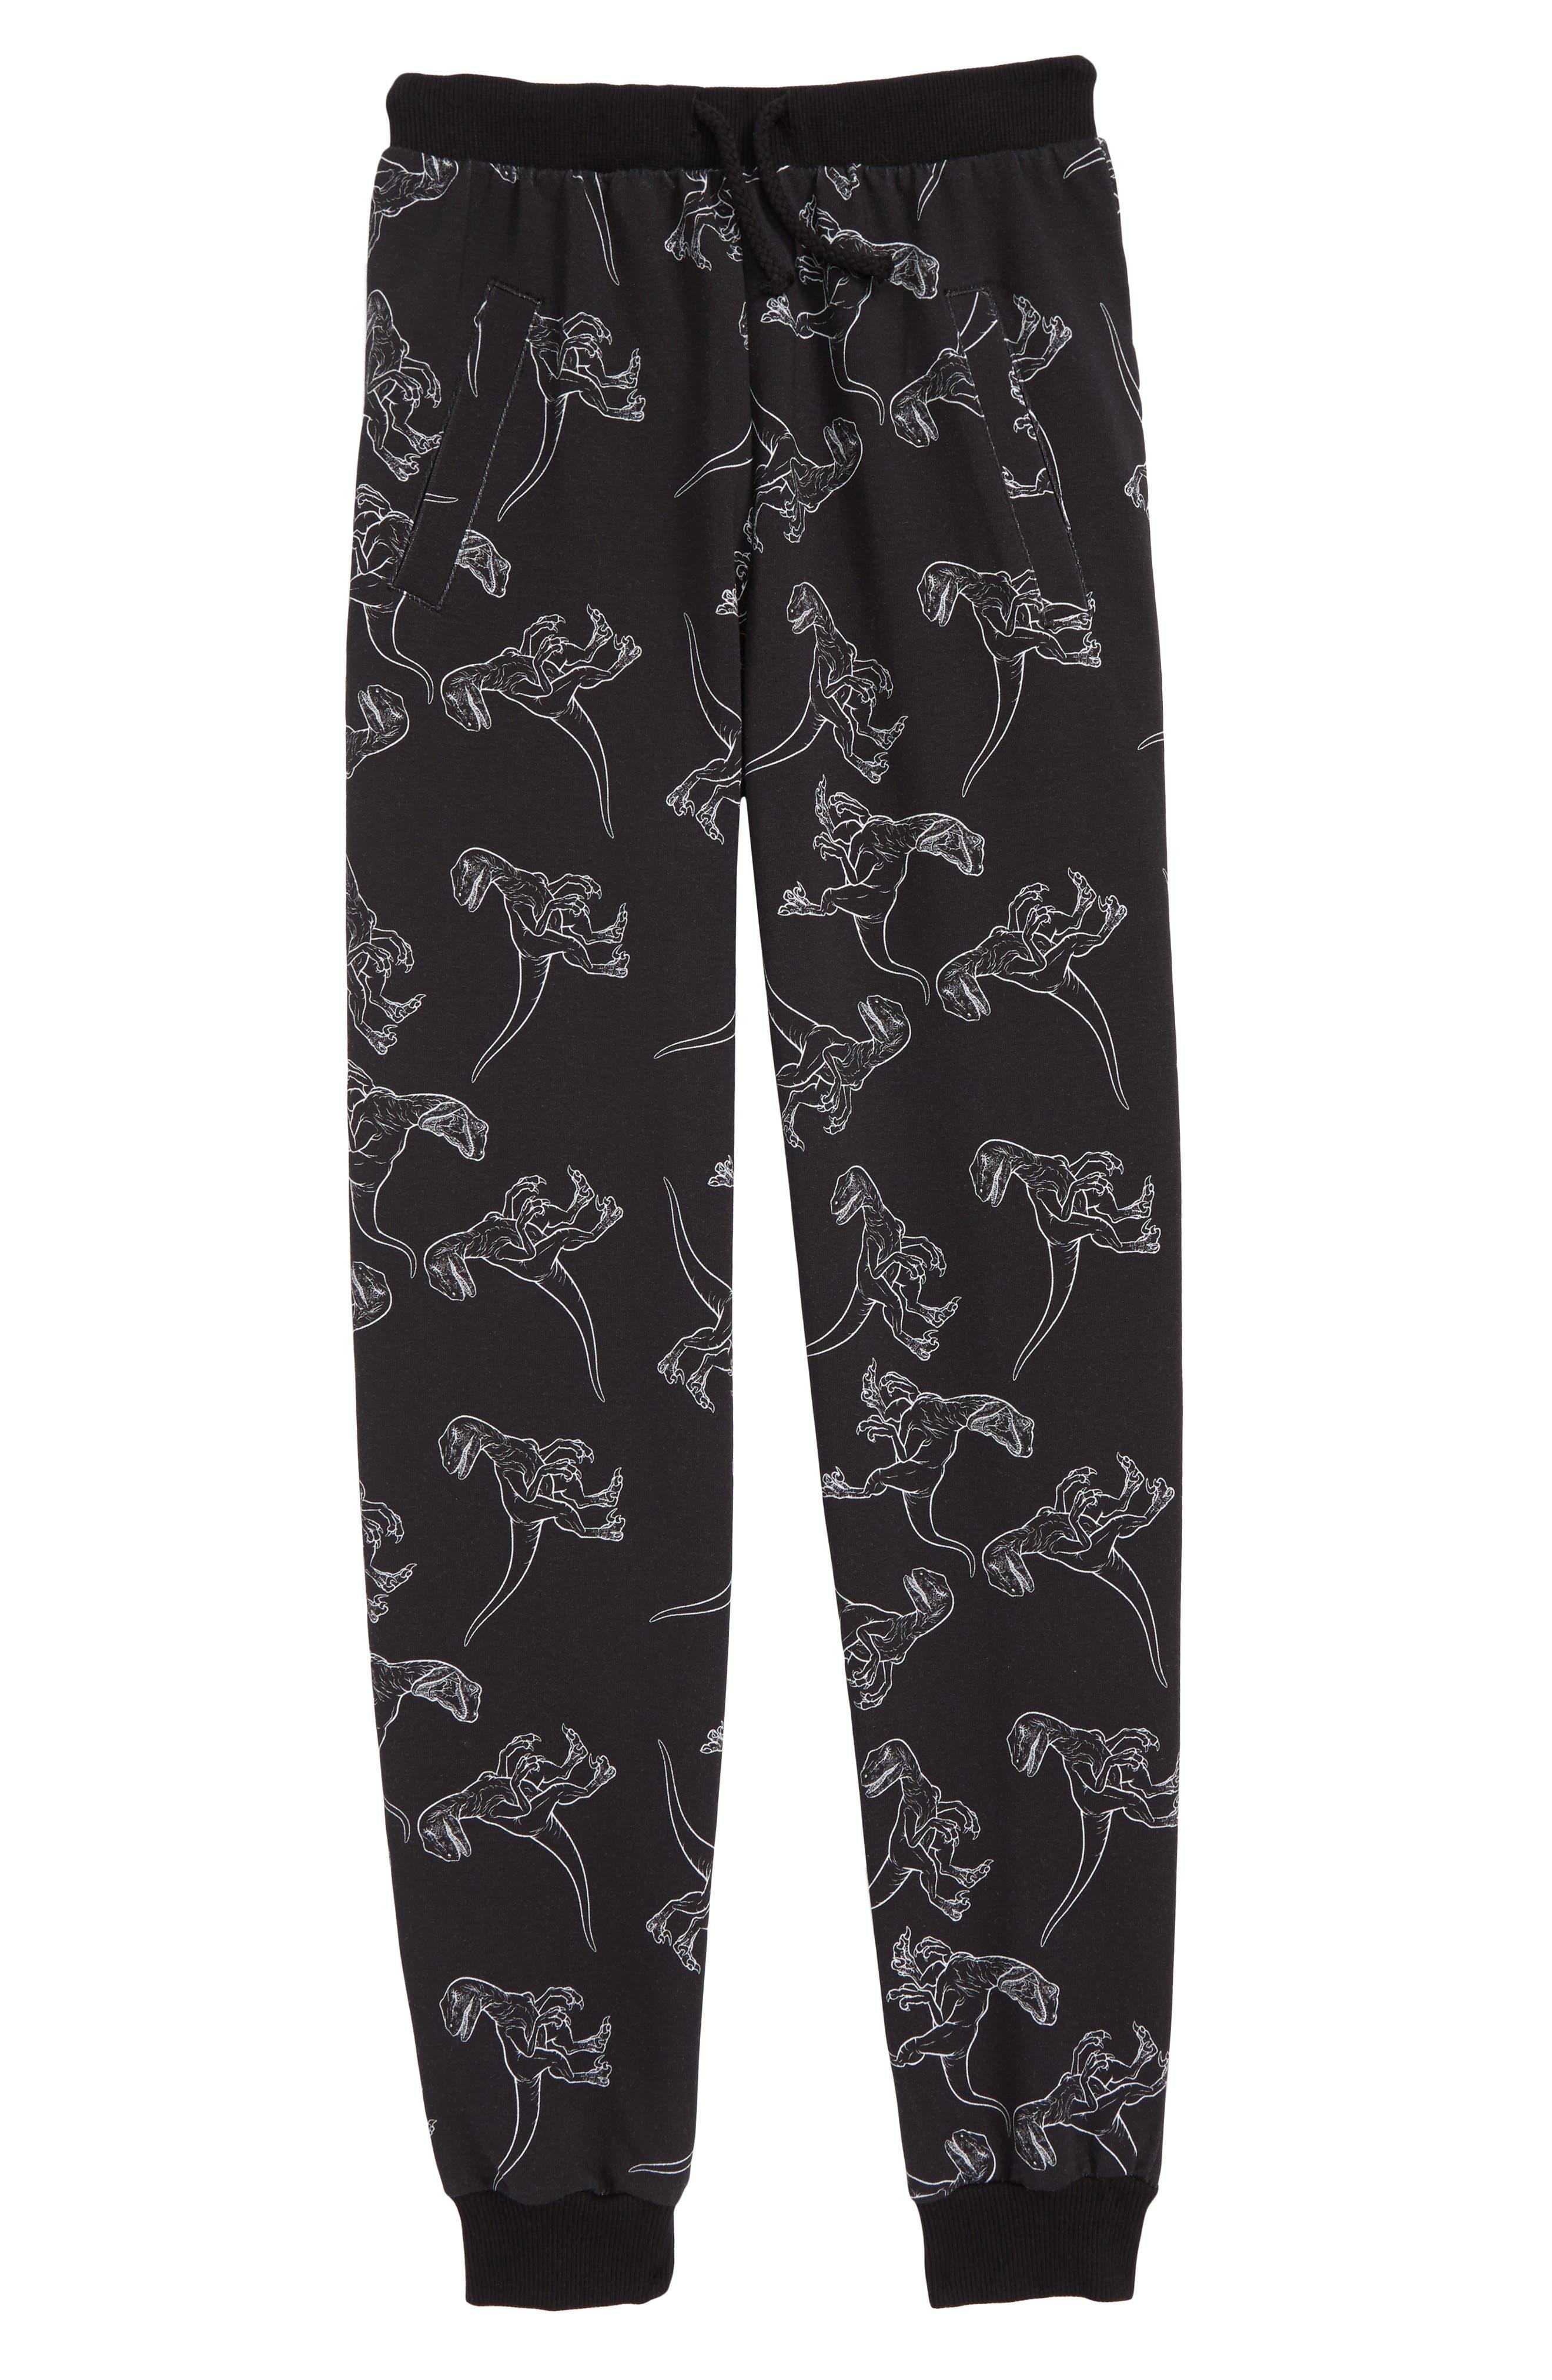 x Jurassic World Isla Sweatpants,                         Main,                         color, 001